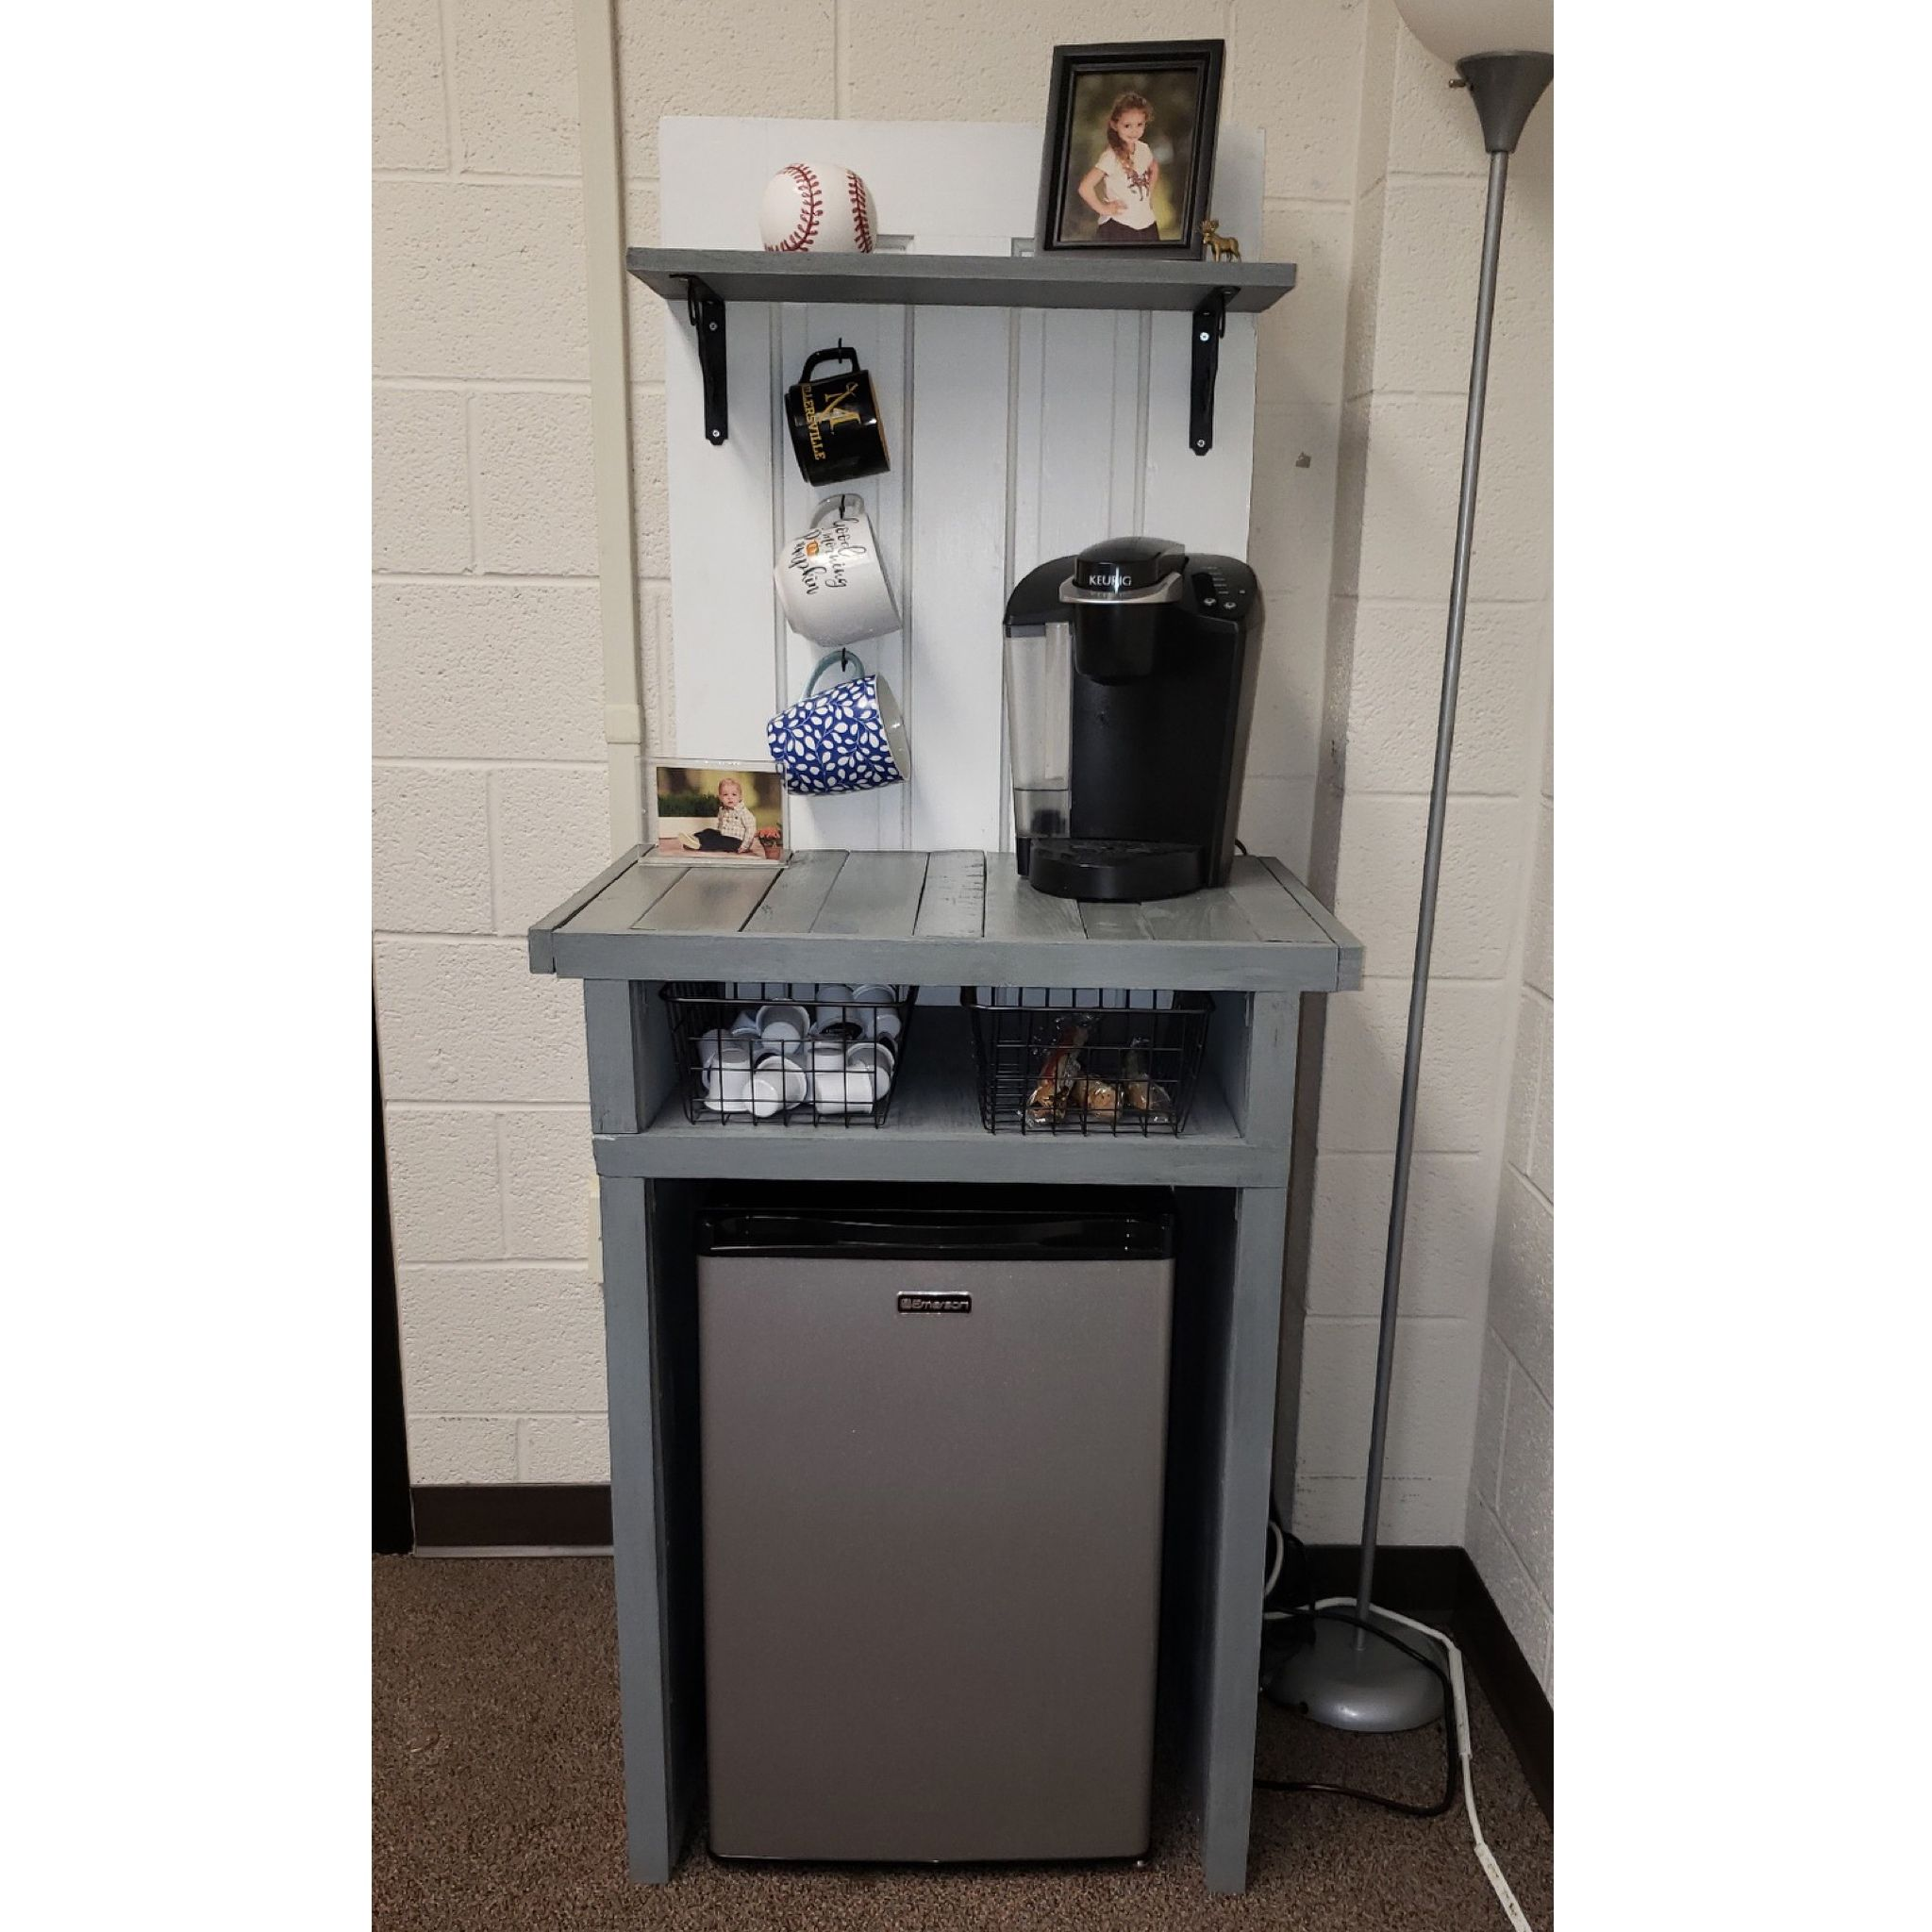 Handmade coffee bar mini fridge cabinet. It was custom built to fit the mini fridge and displays ...